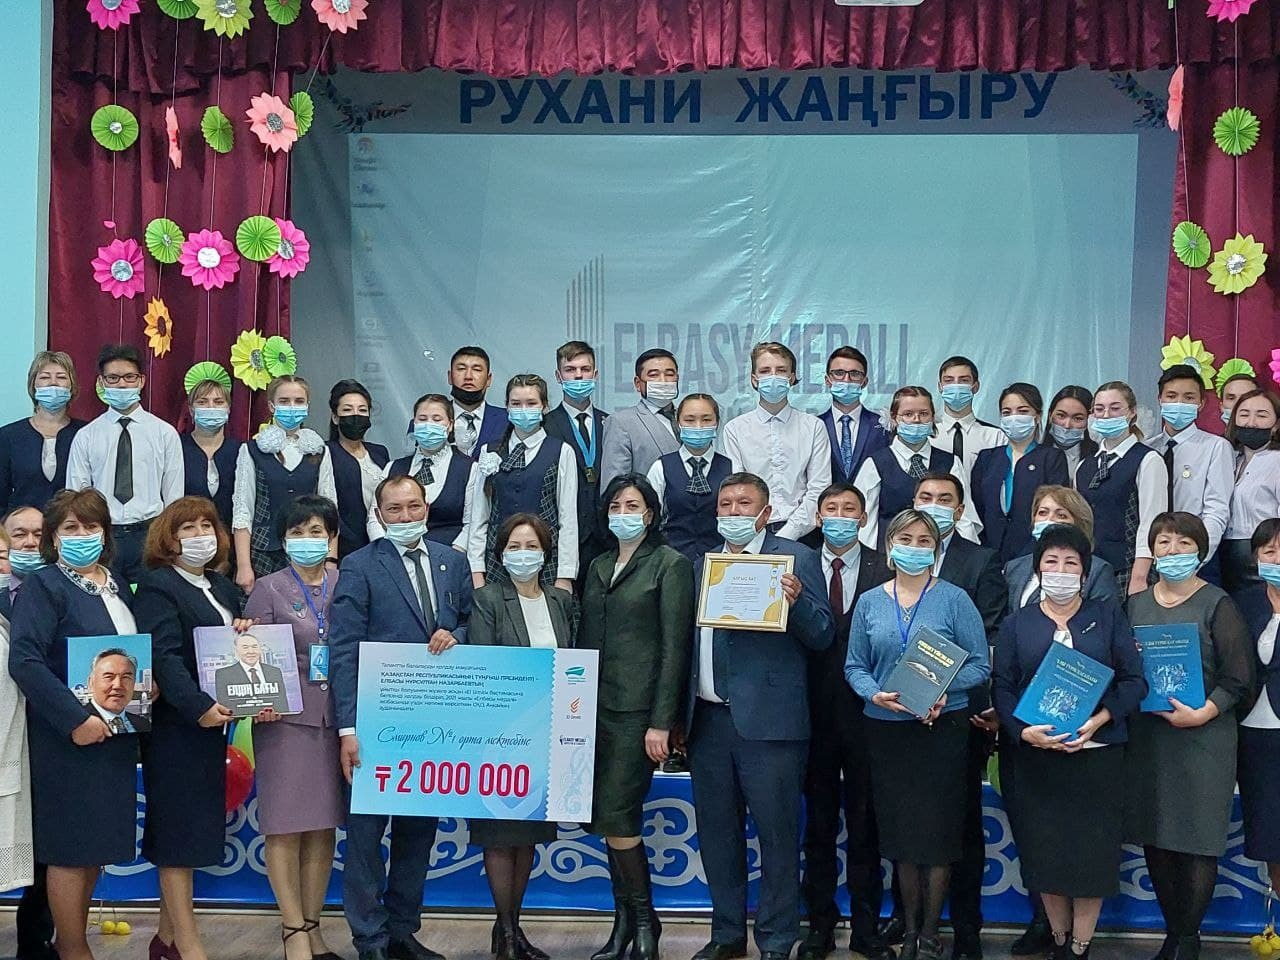 На севере Казахстана учителя получили сертификат на 2 млн тенге